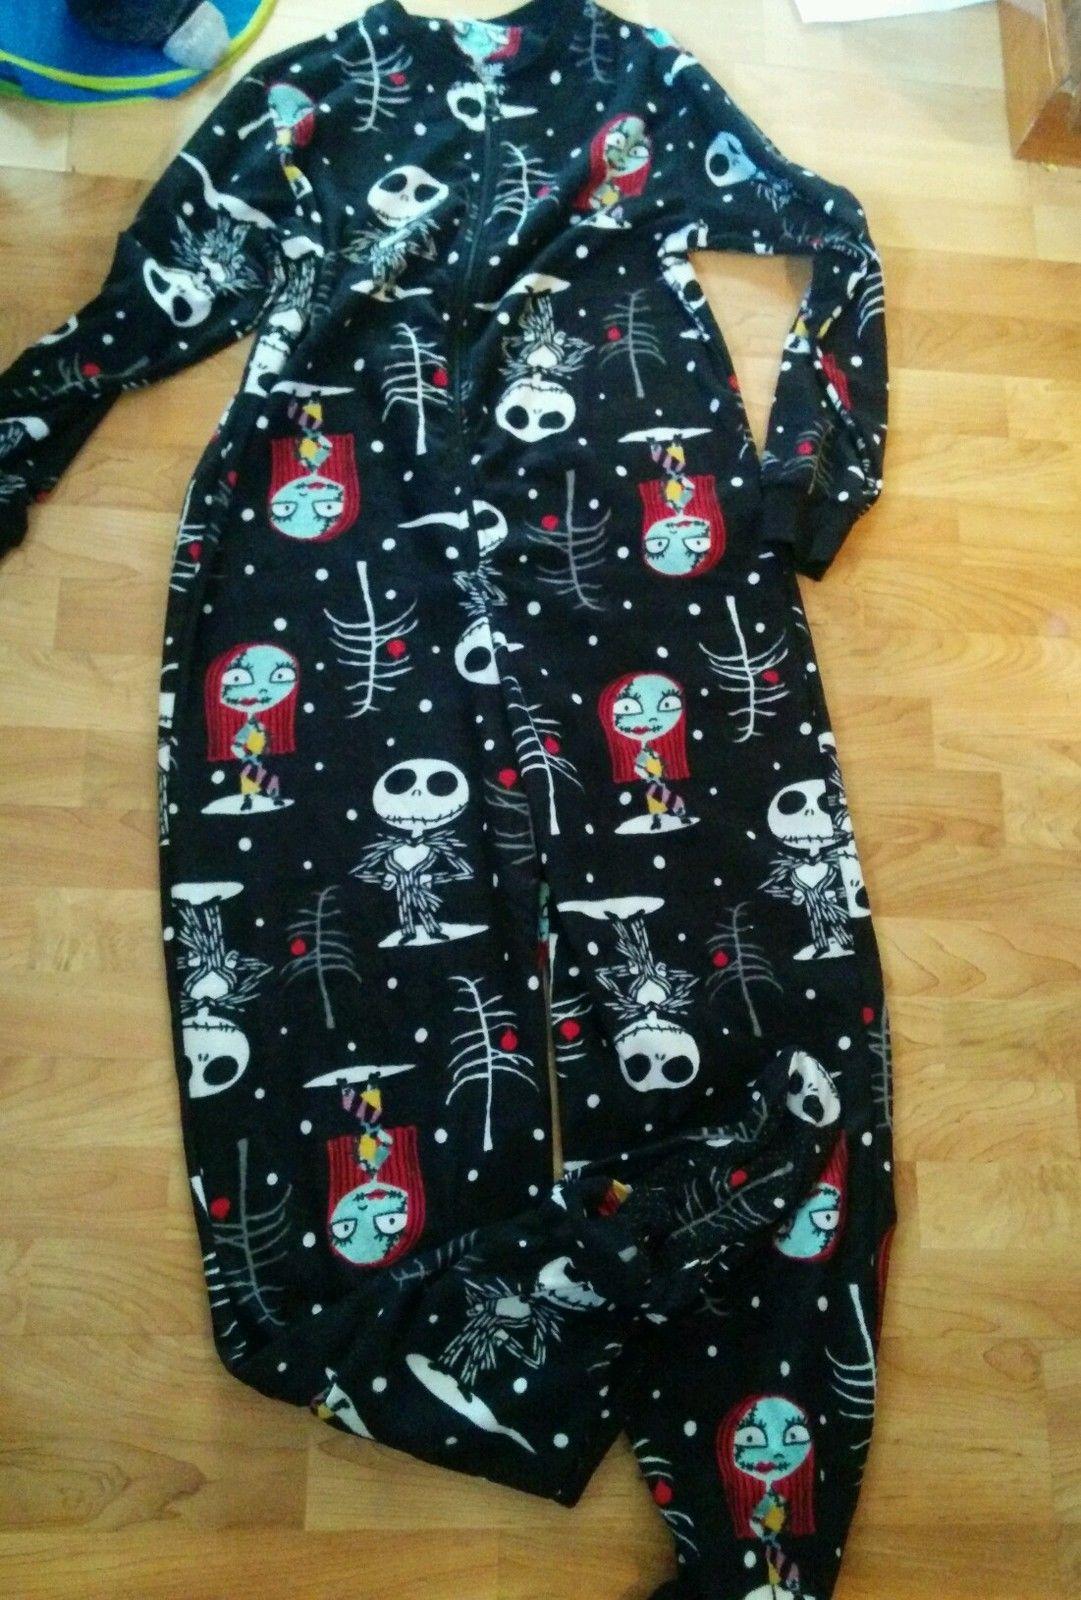 Disney Nightmare Before Christmas Adult Footed Pajamas | eBay ...